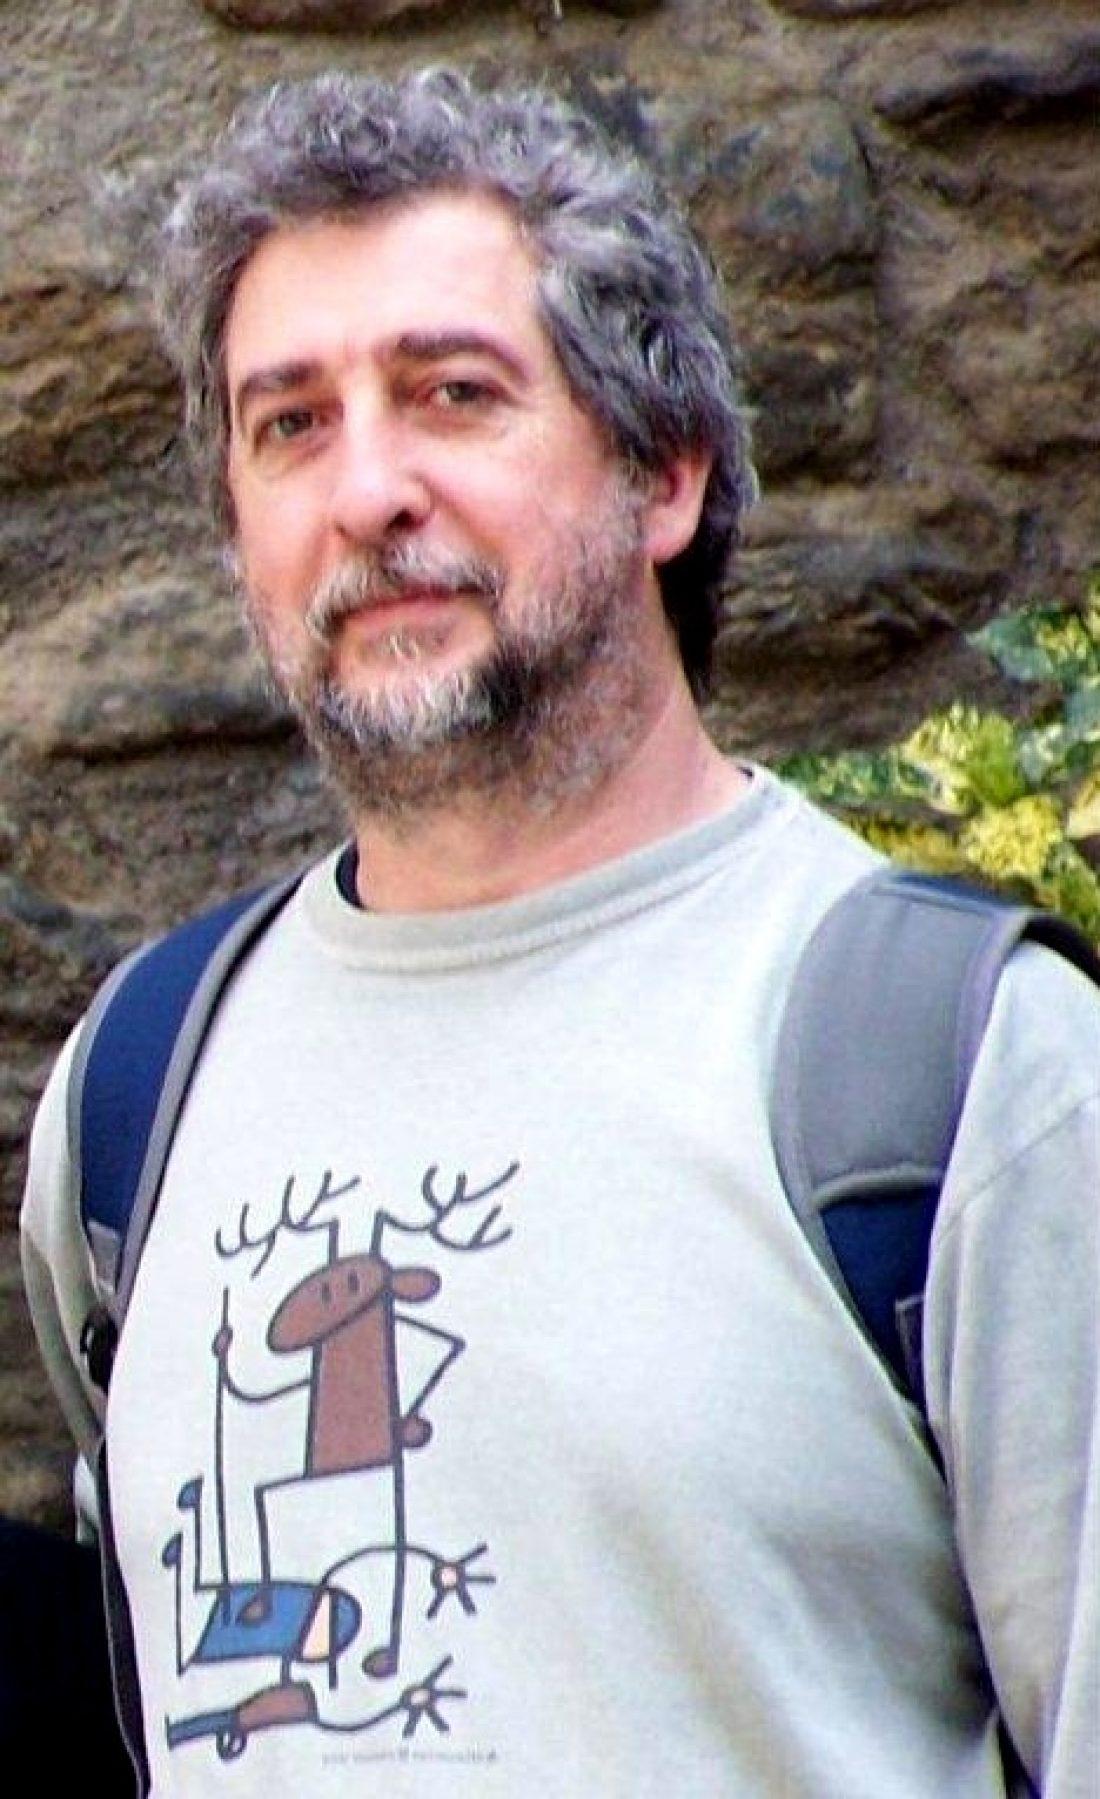 Entrevista a Ángel Bosqued Tapia